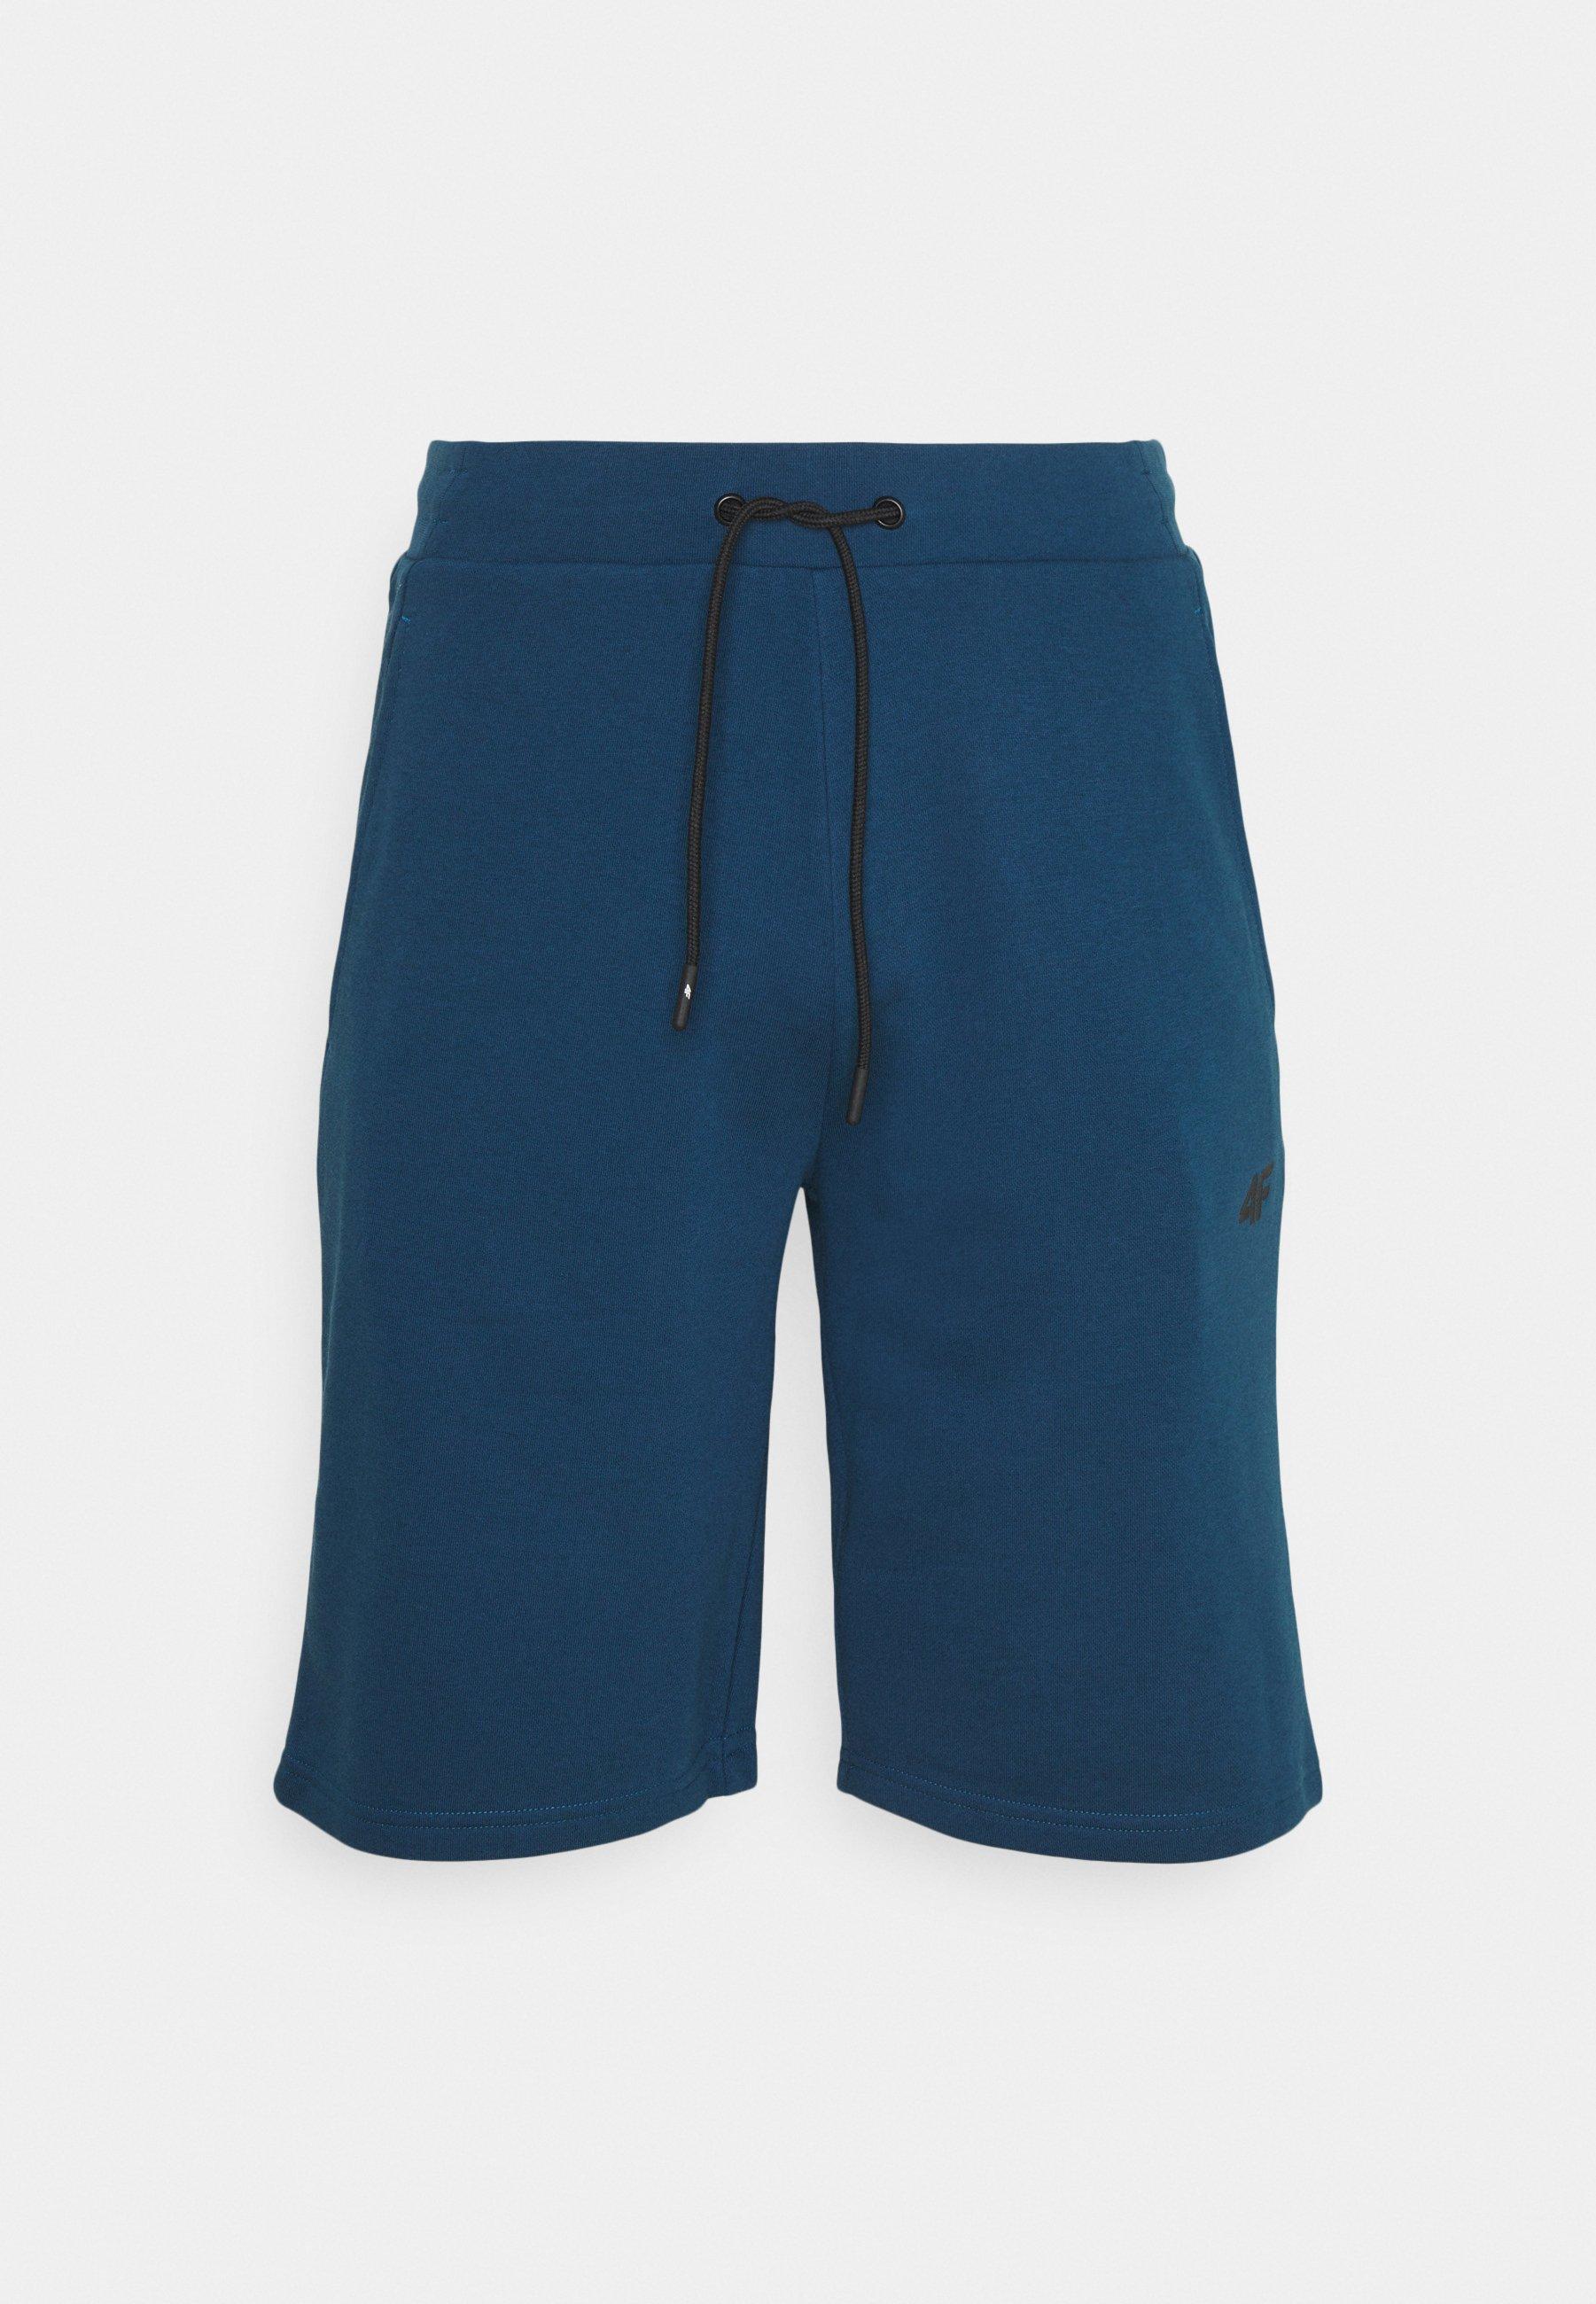 Men Men's sweat shorts - Sports shorts